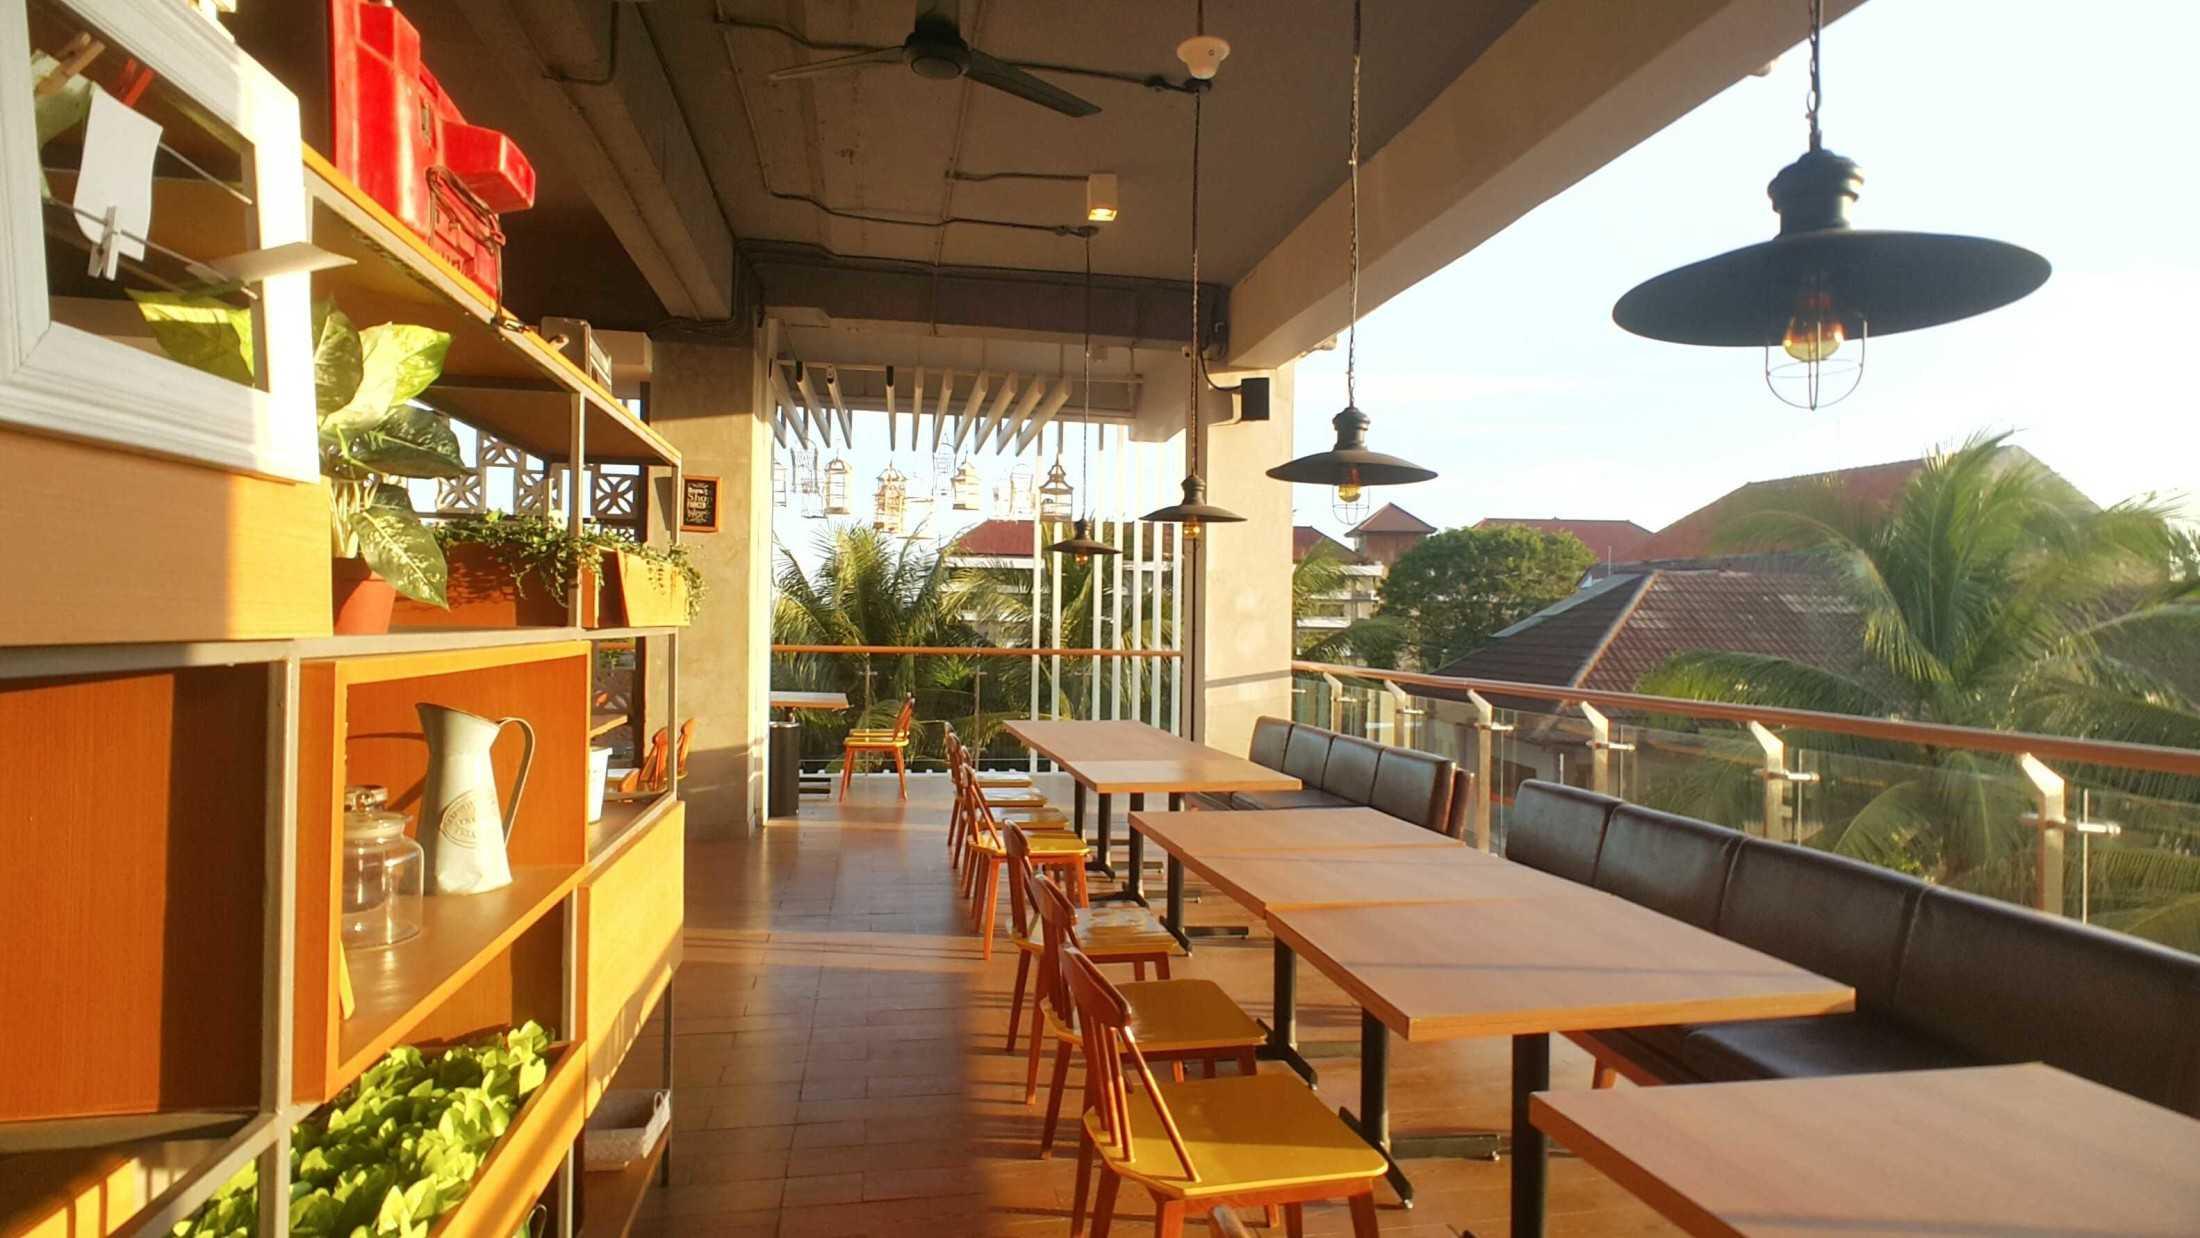 Parametr Rupacita Park Mall 23, Bali Kuta, Kabupaten Badung, Bali, Indonesia Kuta, Kabupaten Badung, Bali, Indonesia Parametr-Rupacita-Park-Mall-23  57732